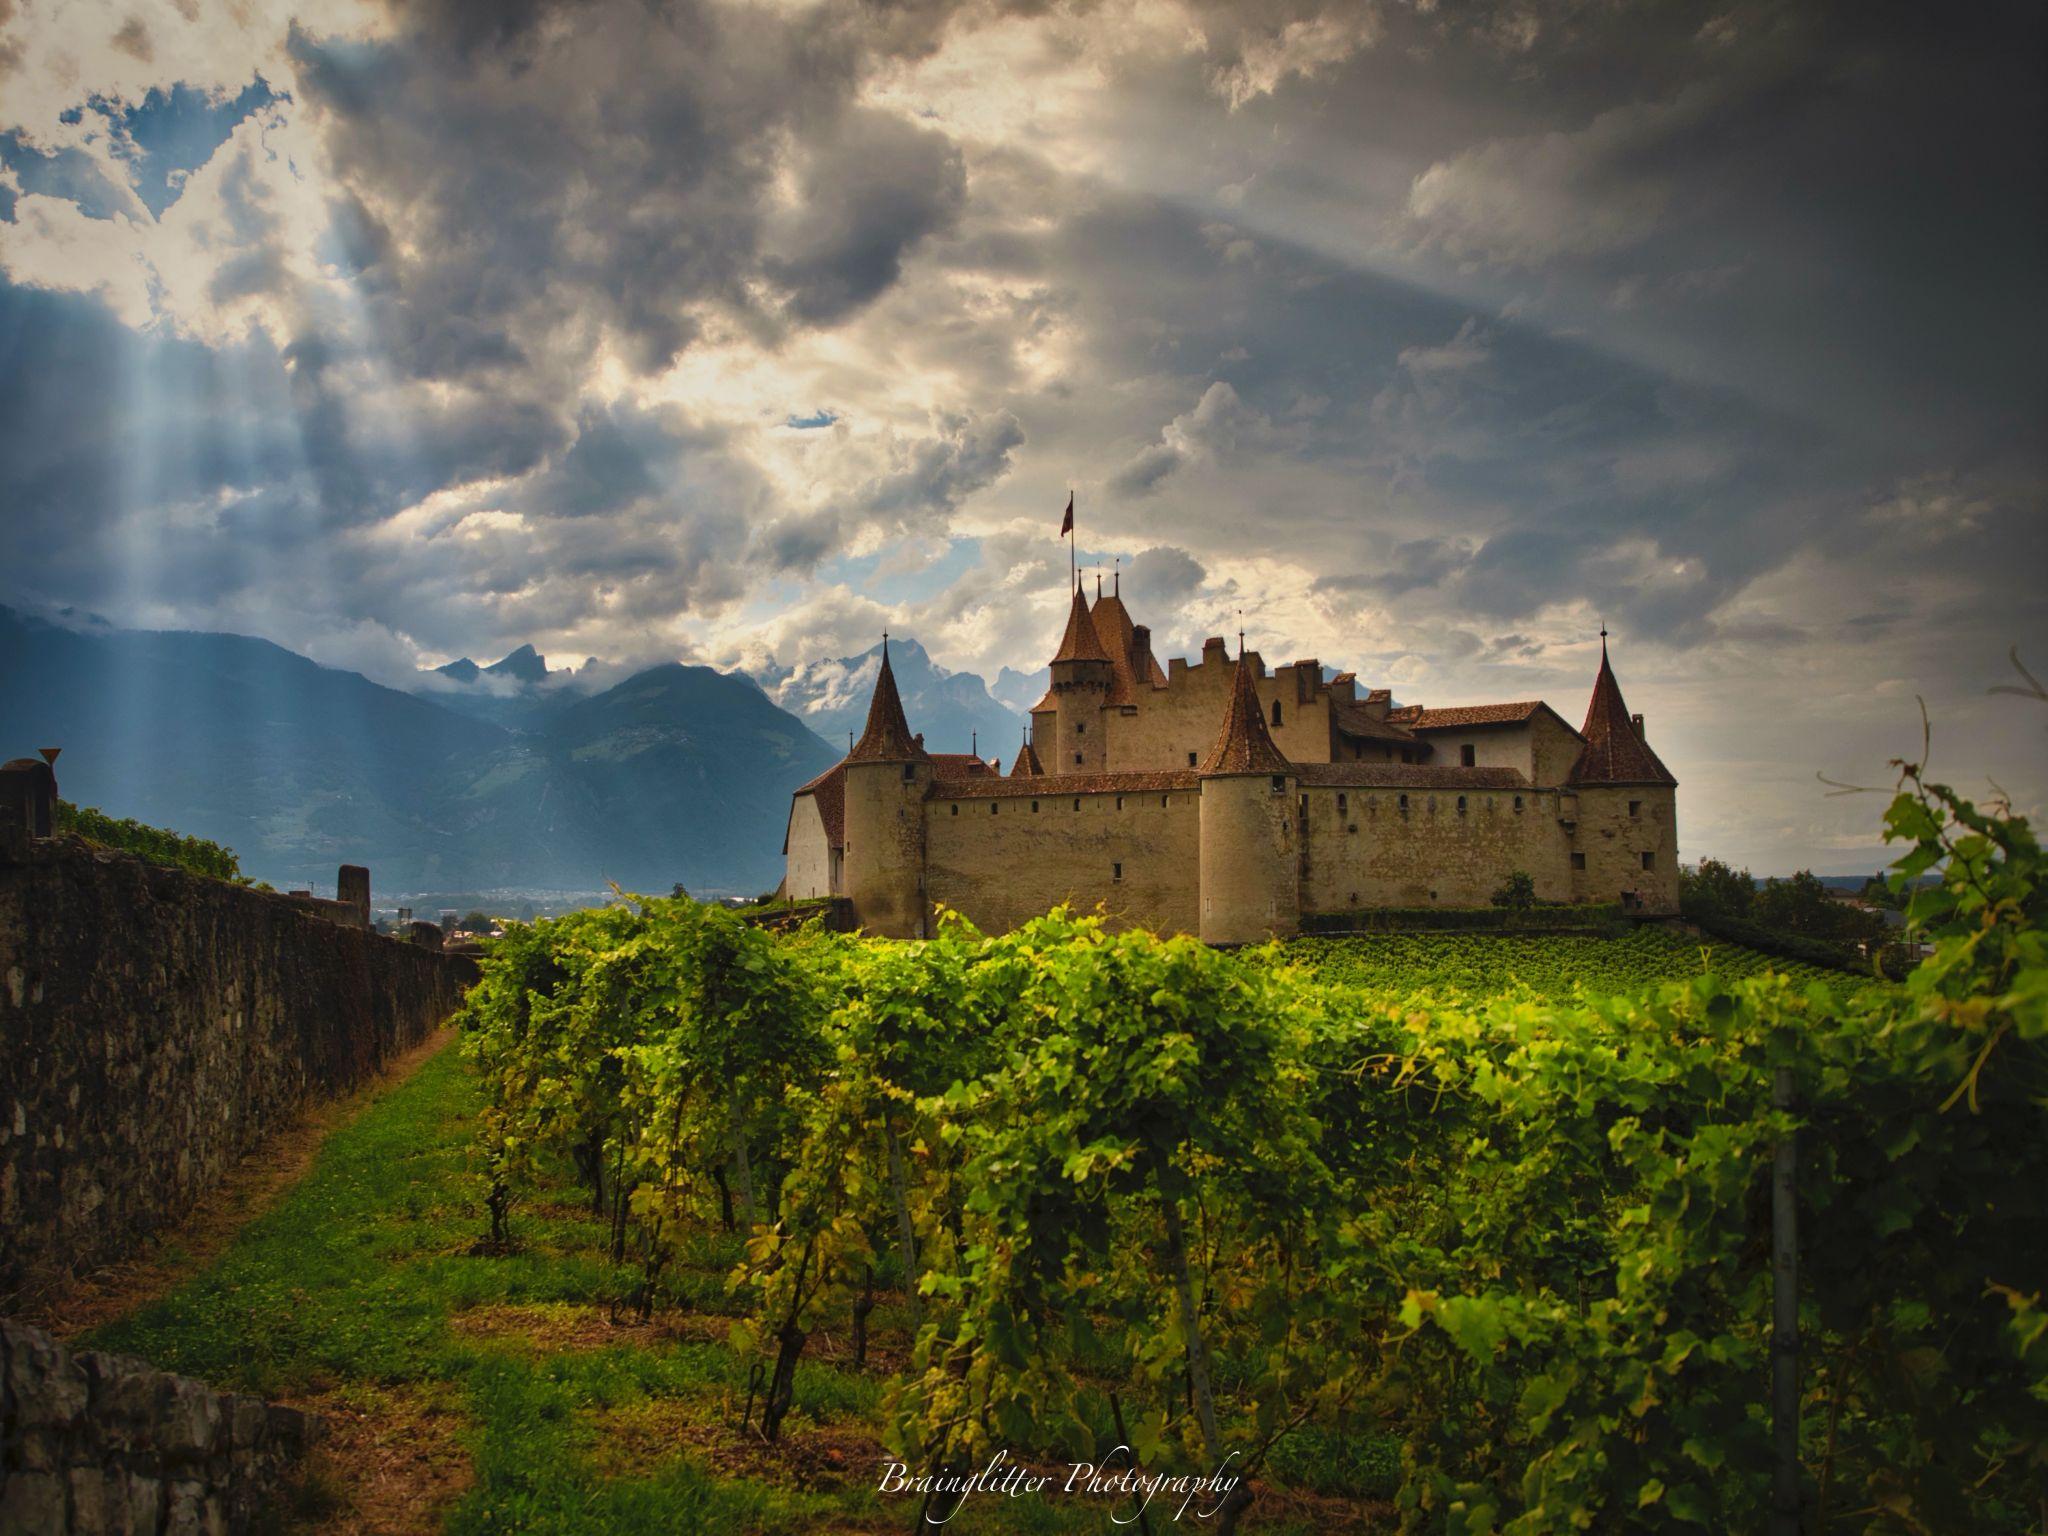 Area of Chateau Aigle, Wallis, Switzerland